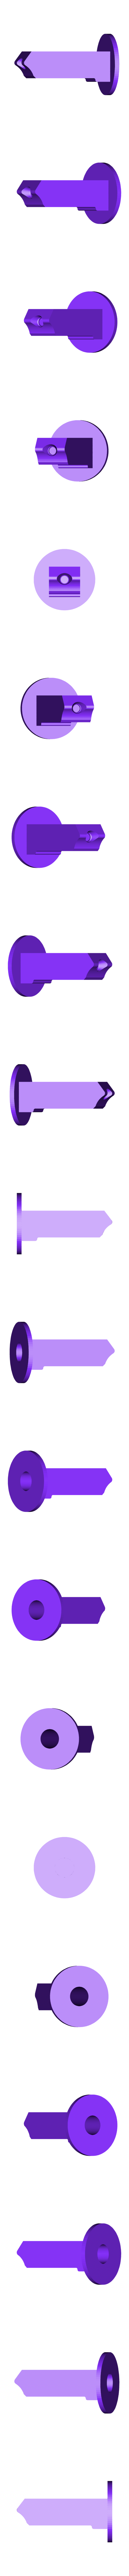 dtitan-p4b.stl Download free STL file dTitan Geared Extruder • 3D printer template, _MSA_